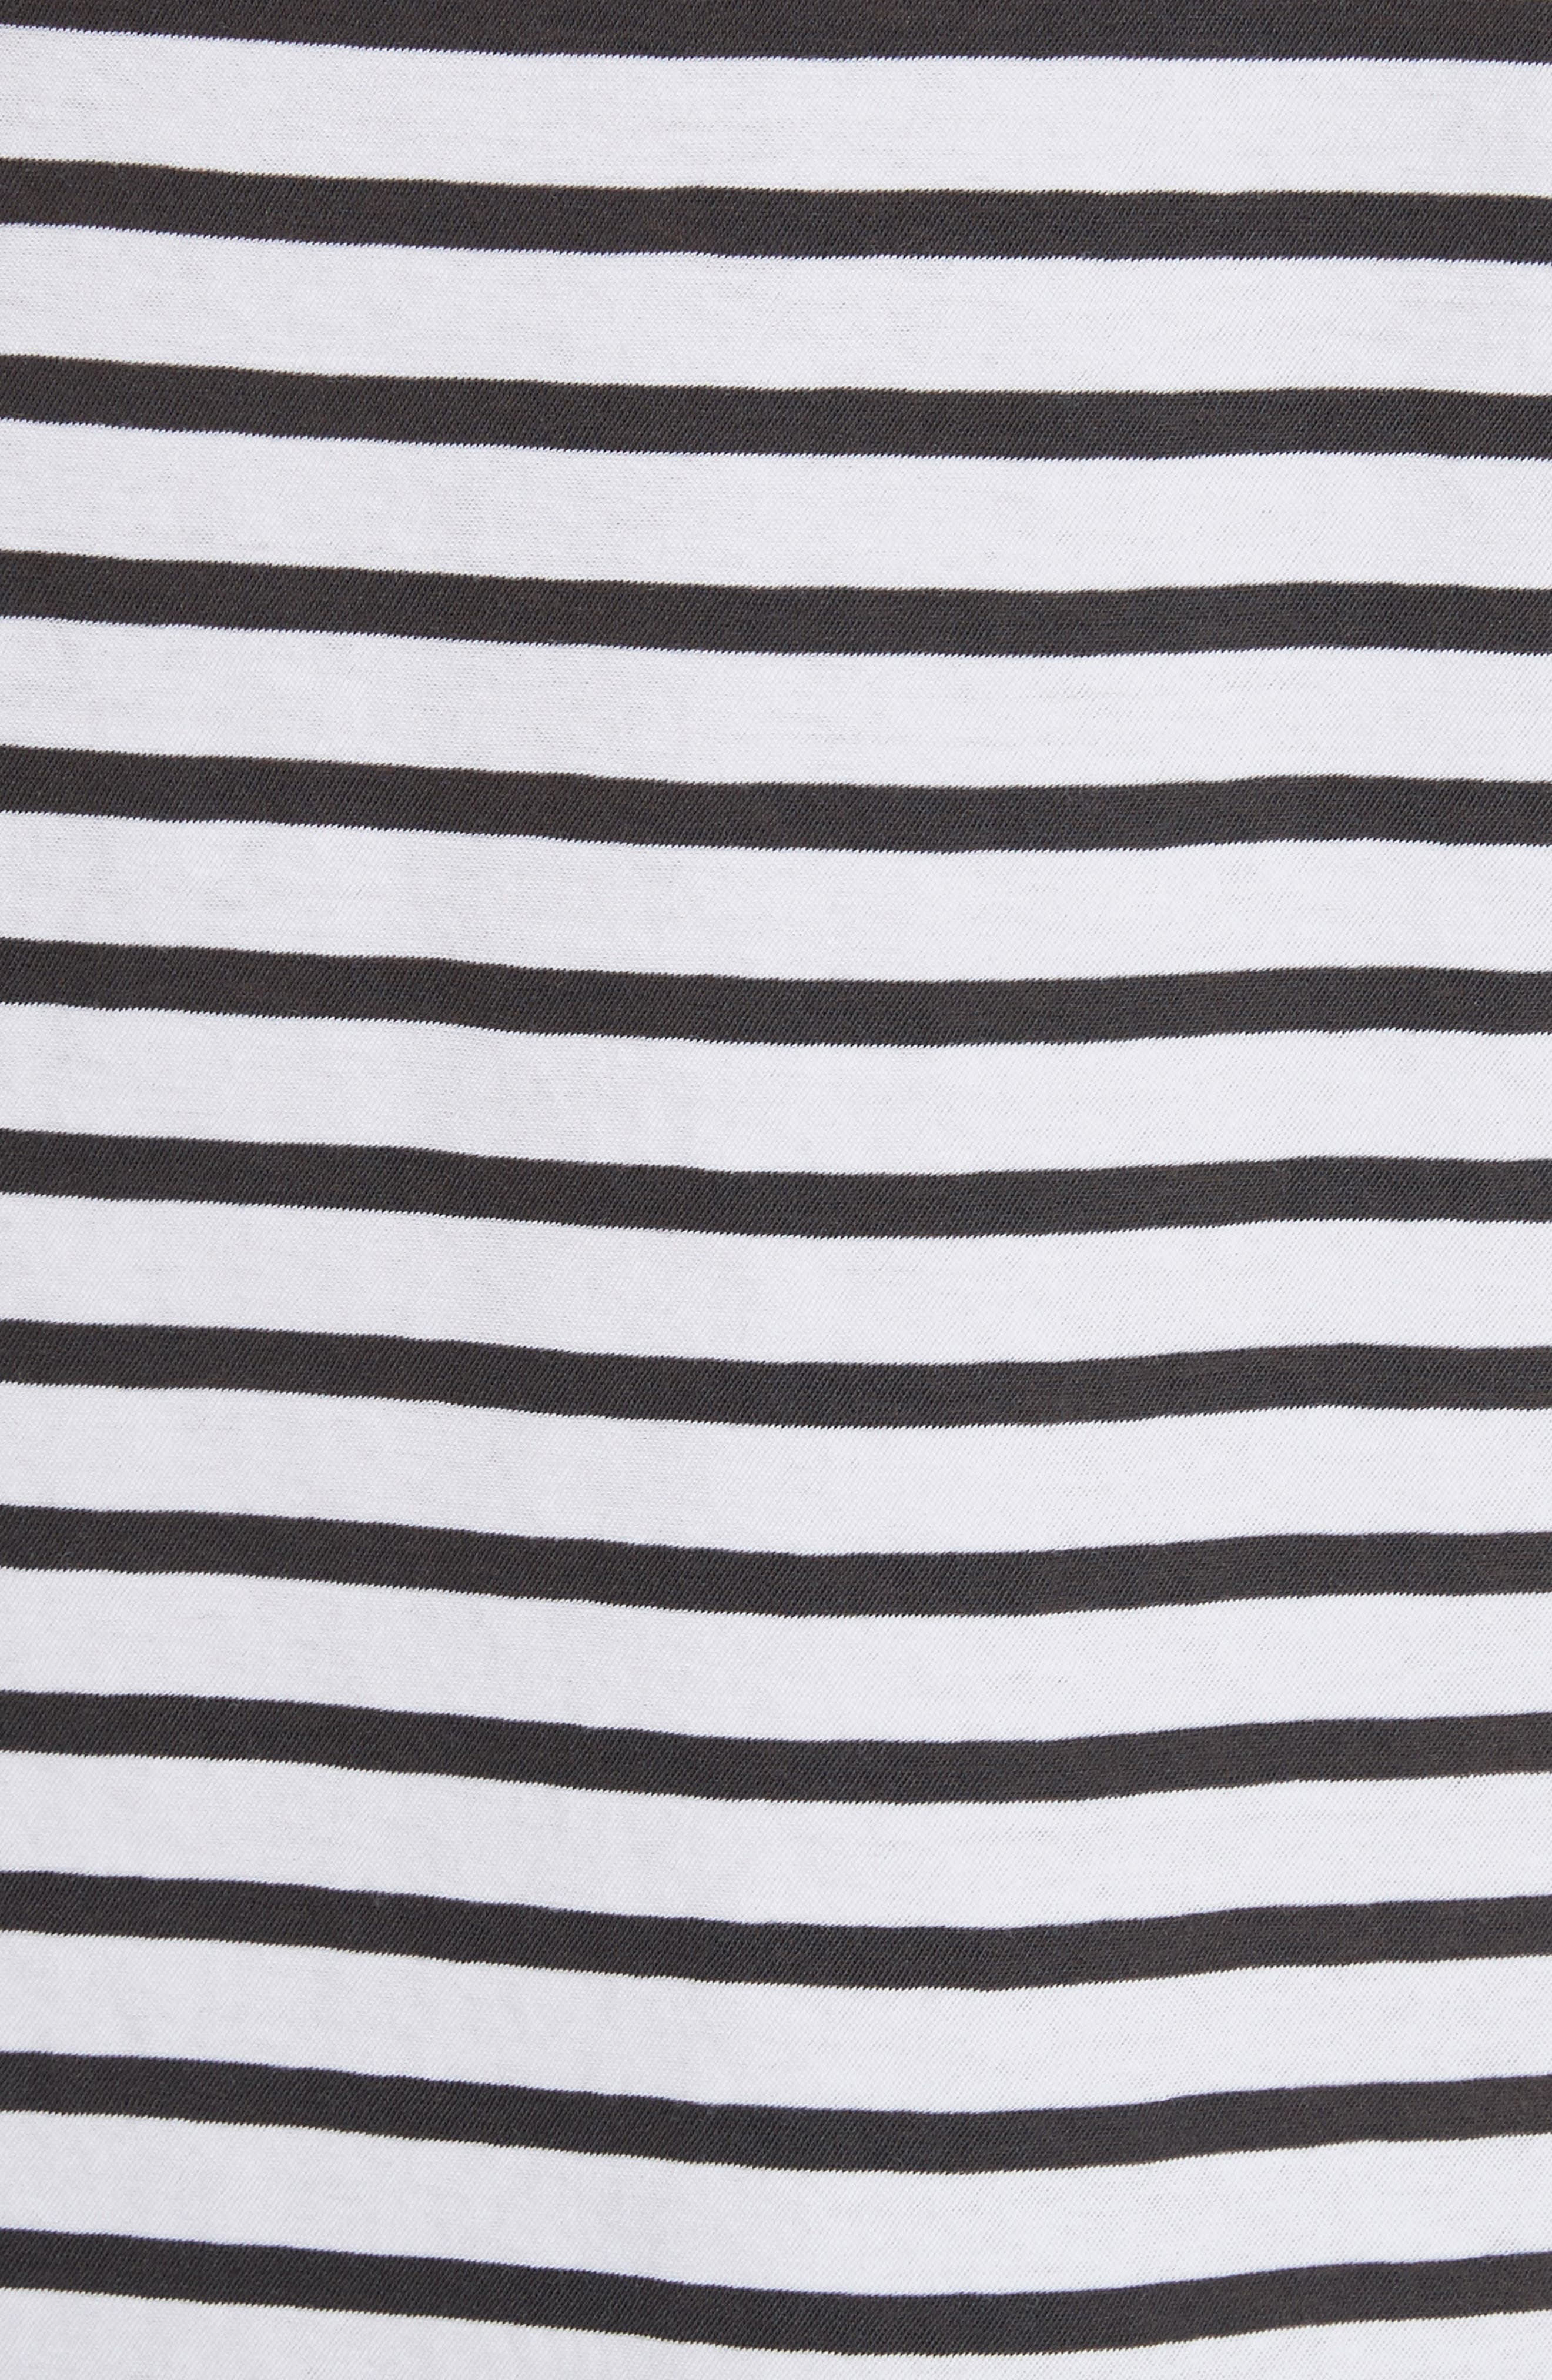 Mila Stripe Tee,                             Alternate thumbnail 5, color,                             White / Coal